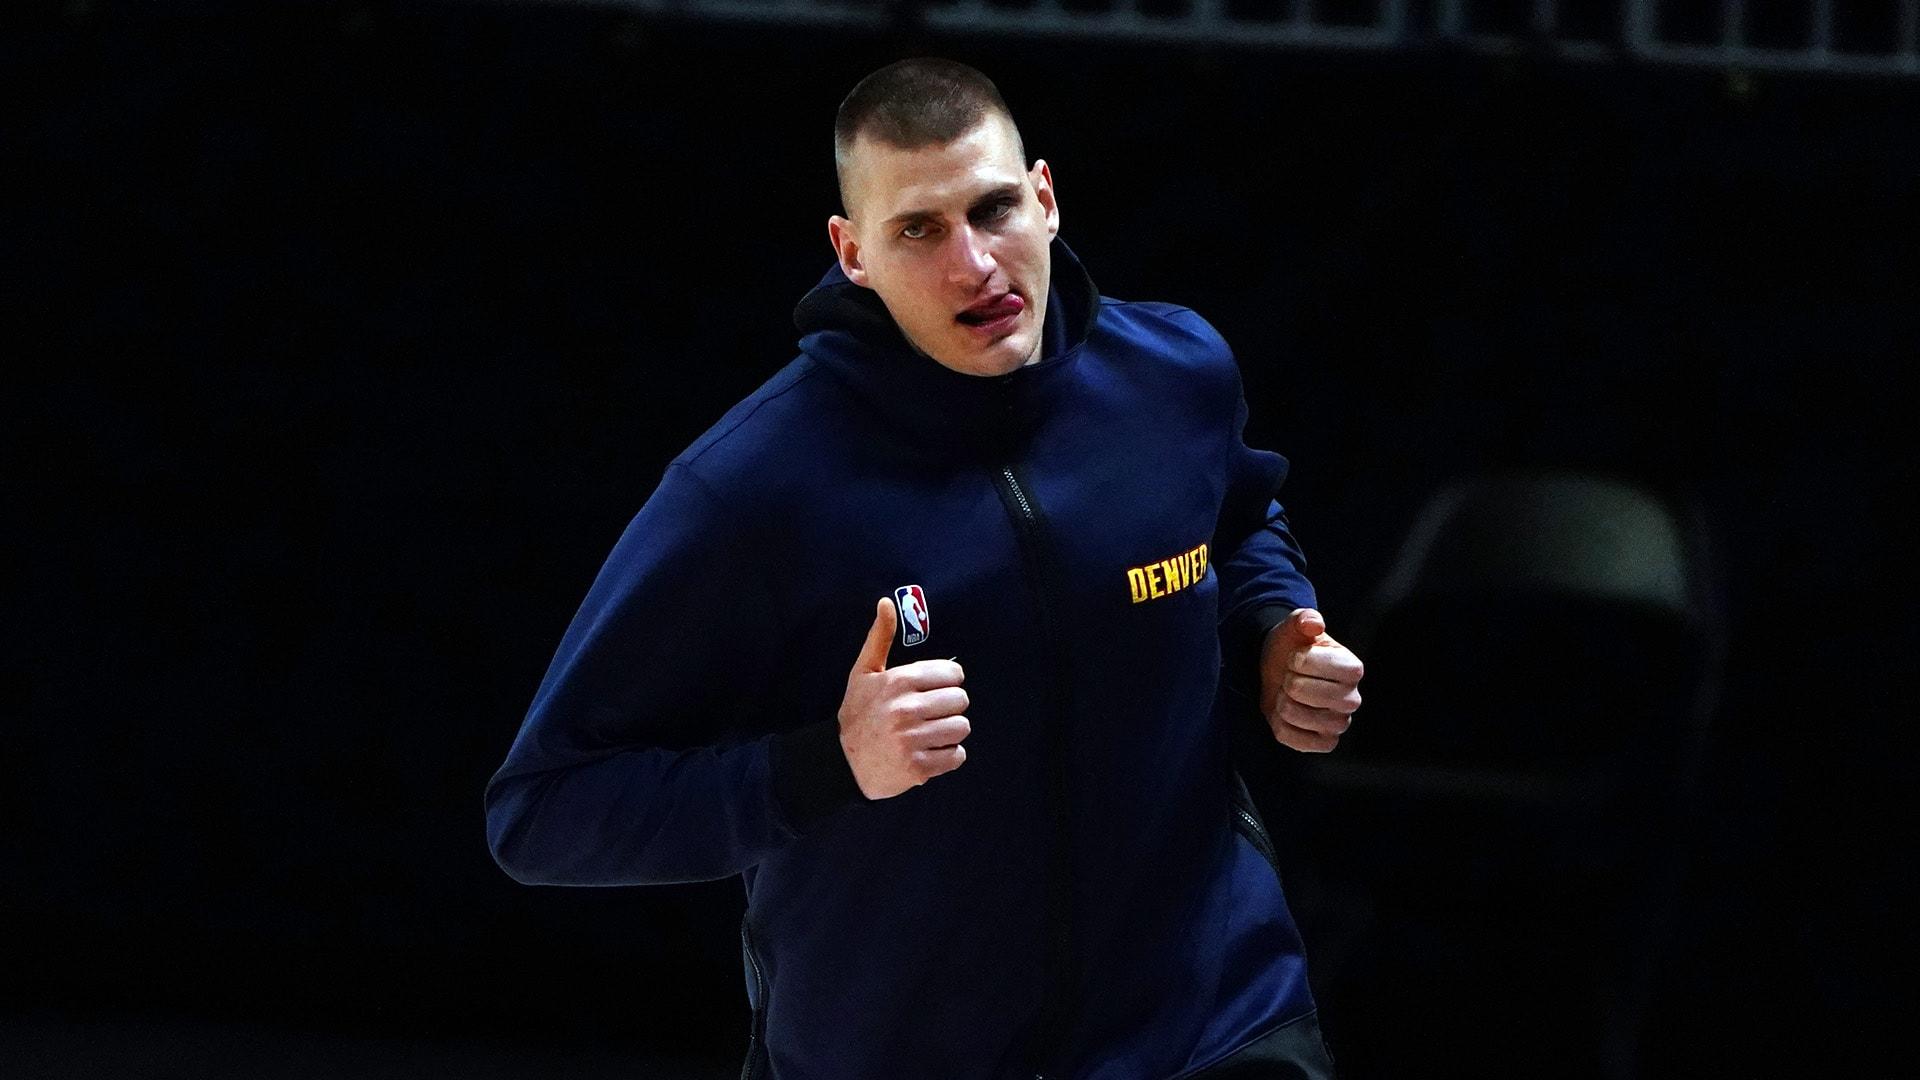 Kia MVP Ladder: Can Jokic turn misfortune into gain?